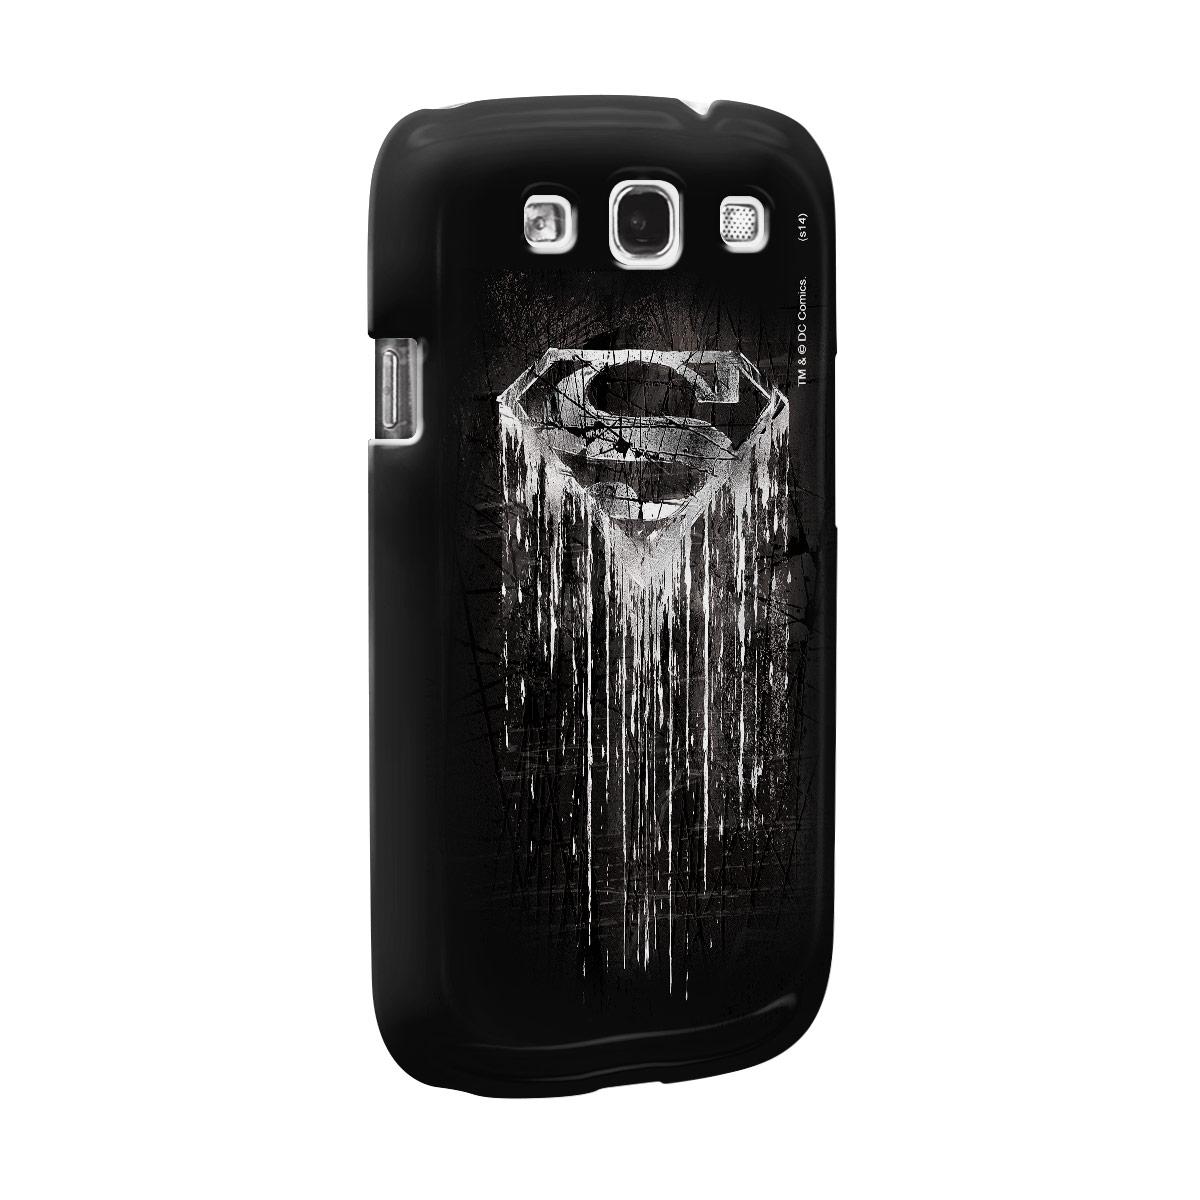 Capa de Celular Samsung Galaxy S3 Superman Steel Melting